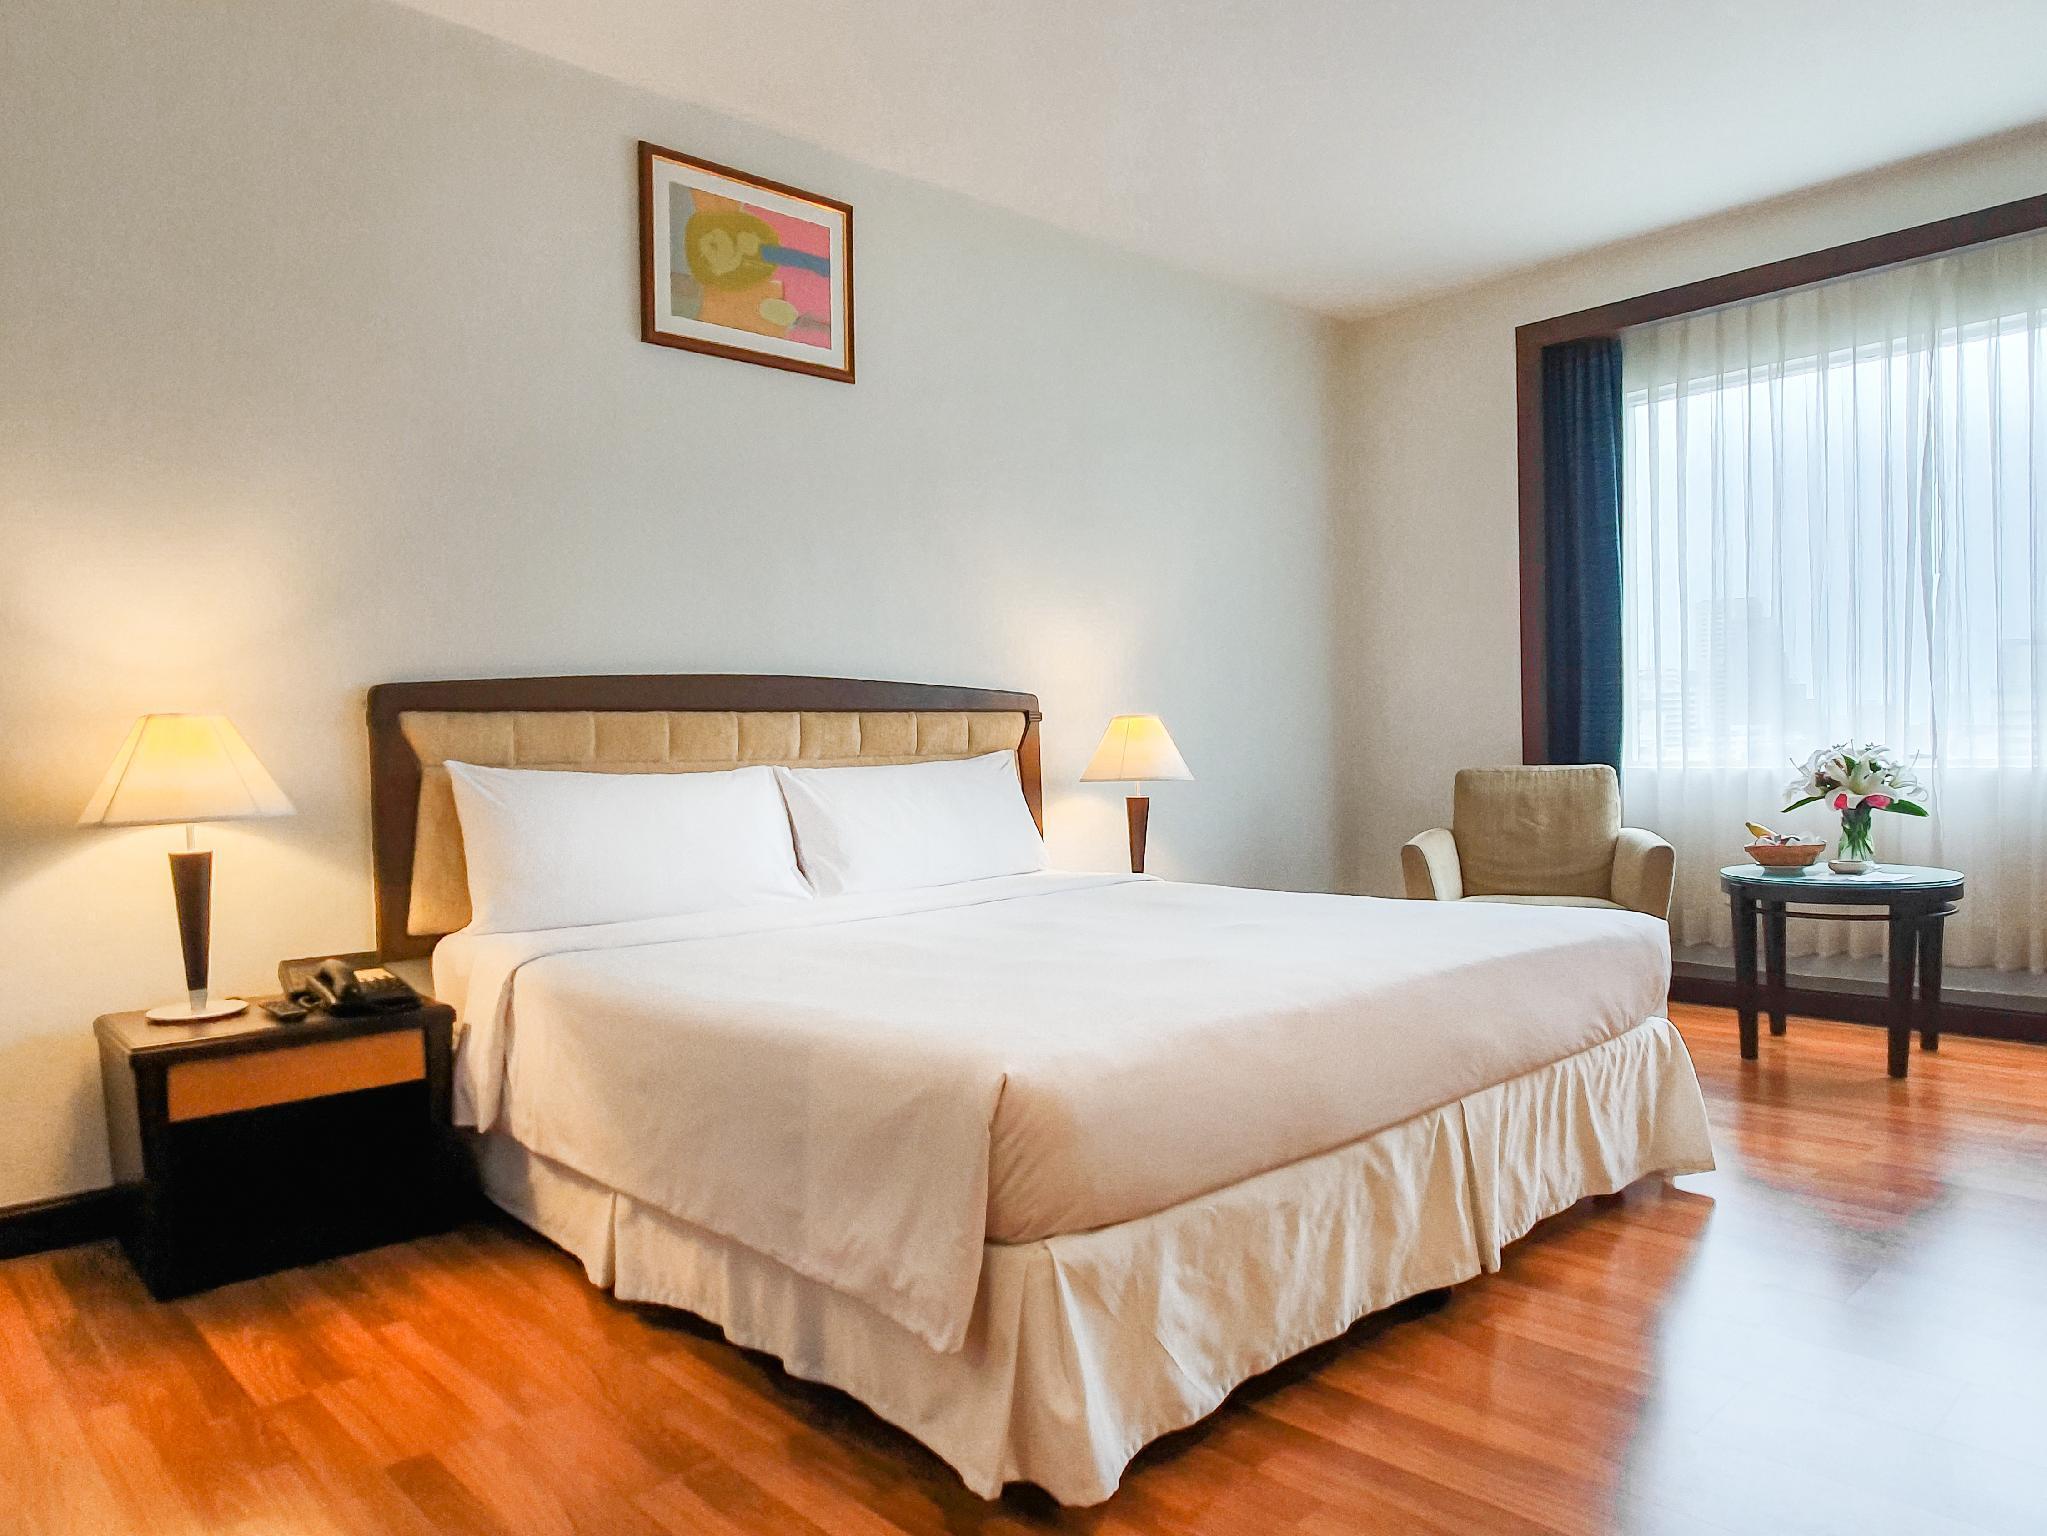 Zenith Sukhumvit Hotel โรงแรมซีนิท สุขุมวิท